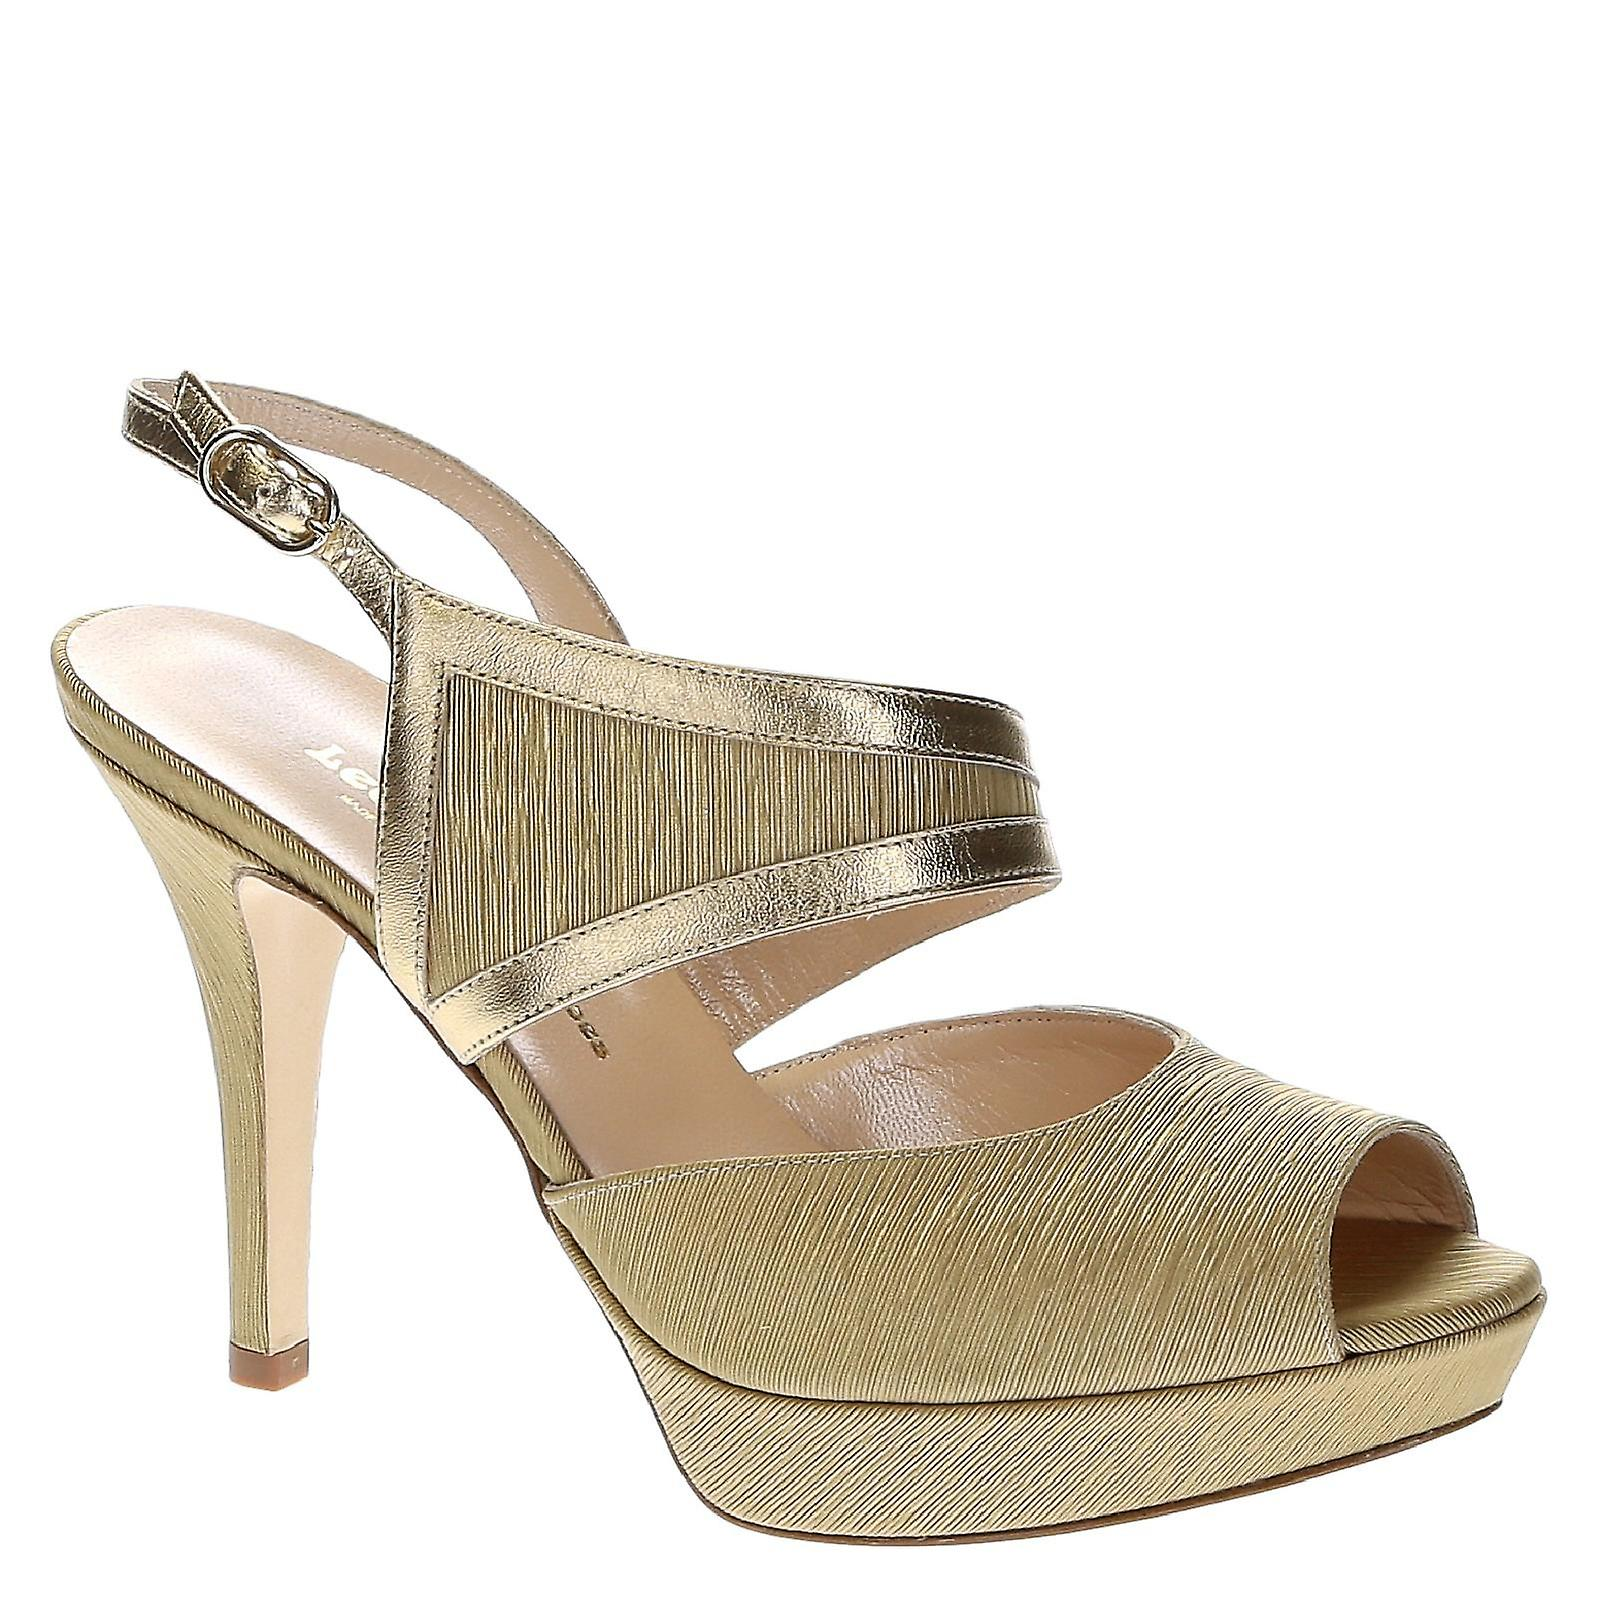 Platform sandals in platinum leather and satin SC3dX